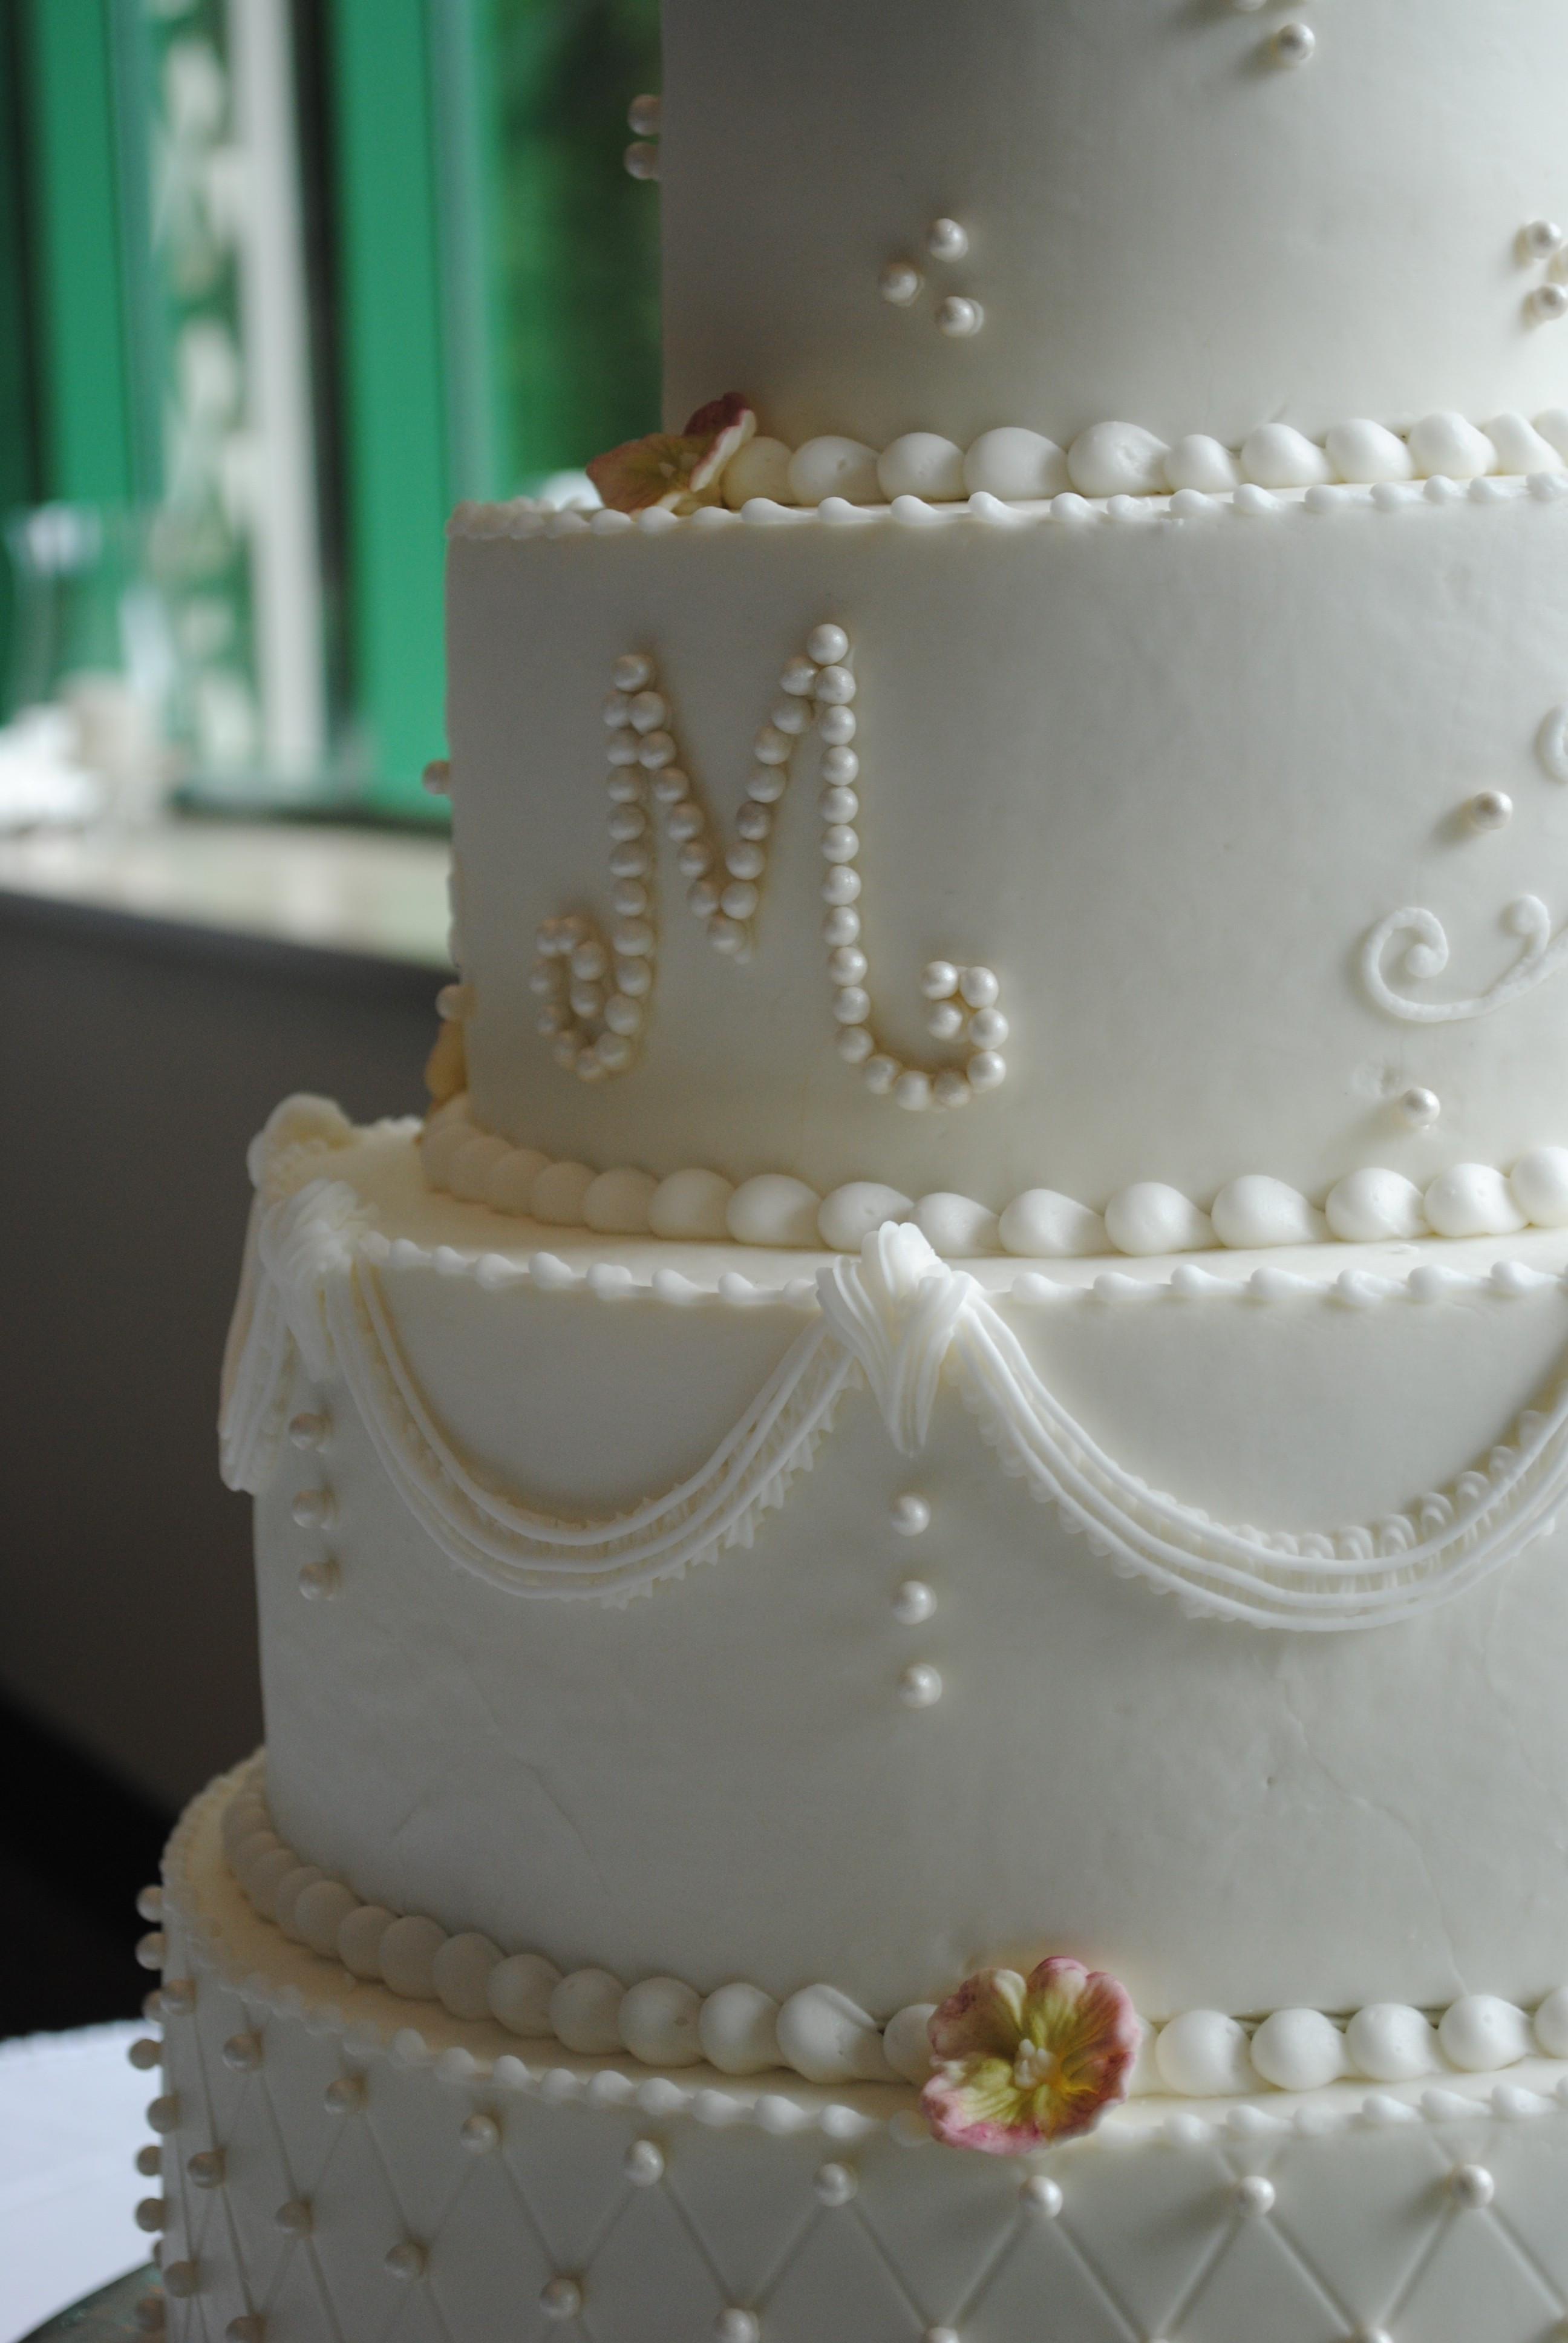 Wedding Cakes Blogs  Kathy and pany s Wedding Cake Blog